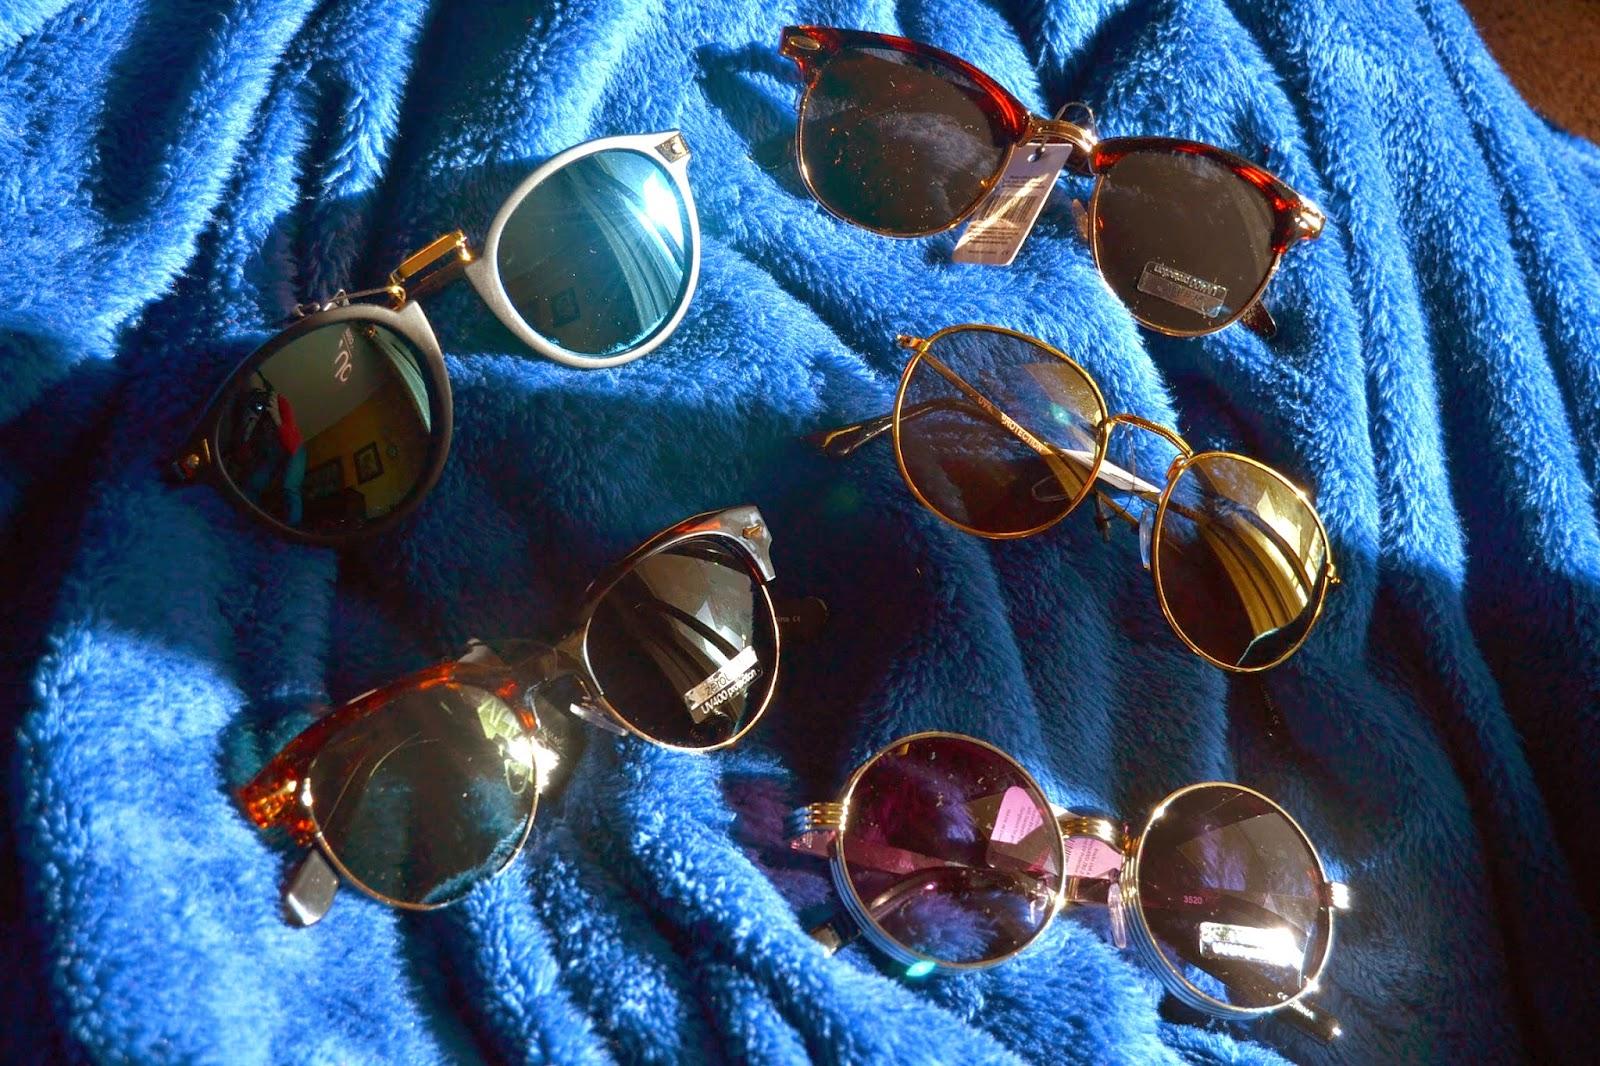 http://www.syriouslyinfashion.com/2015/02/zerouv-sunglasses-fashion-blogger-syrious-roberto.html